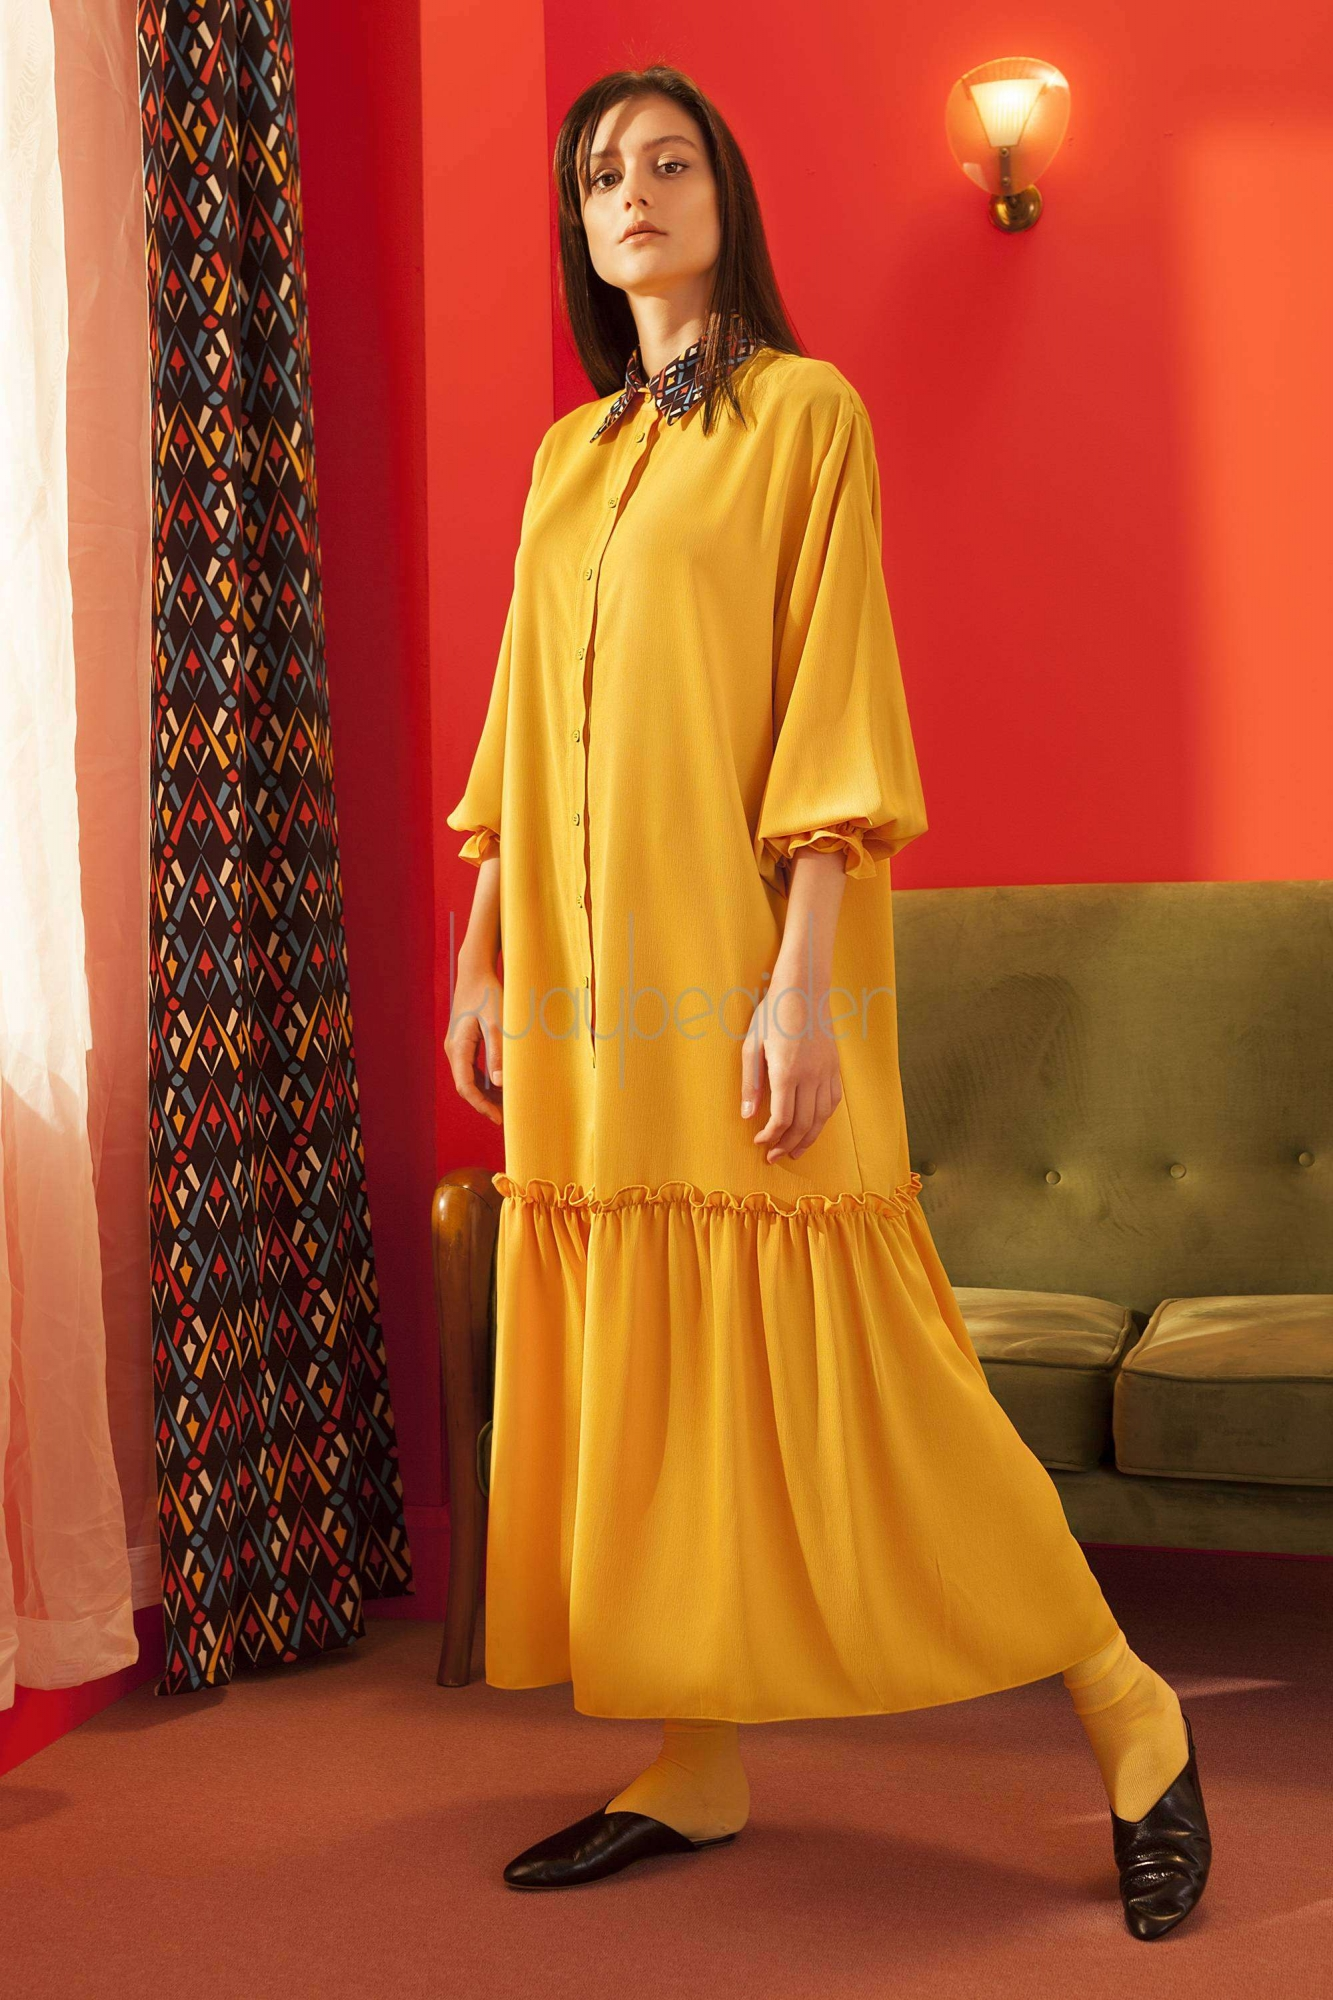 Kuaybe Gider - Giorno Elbise